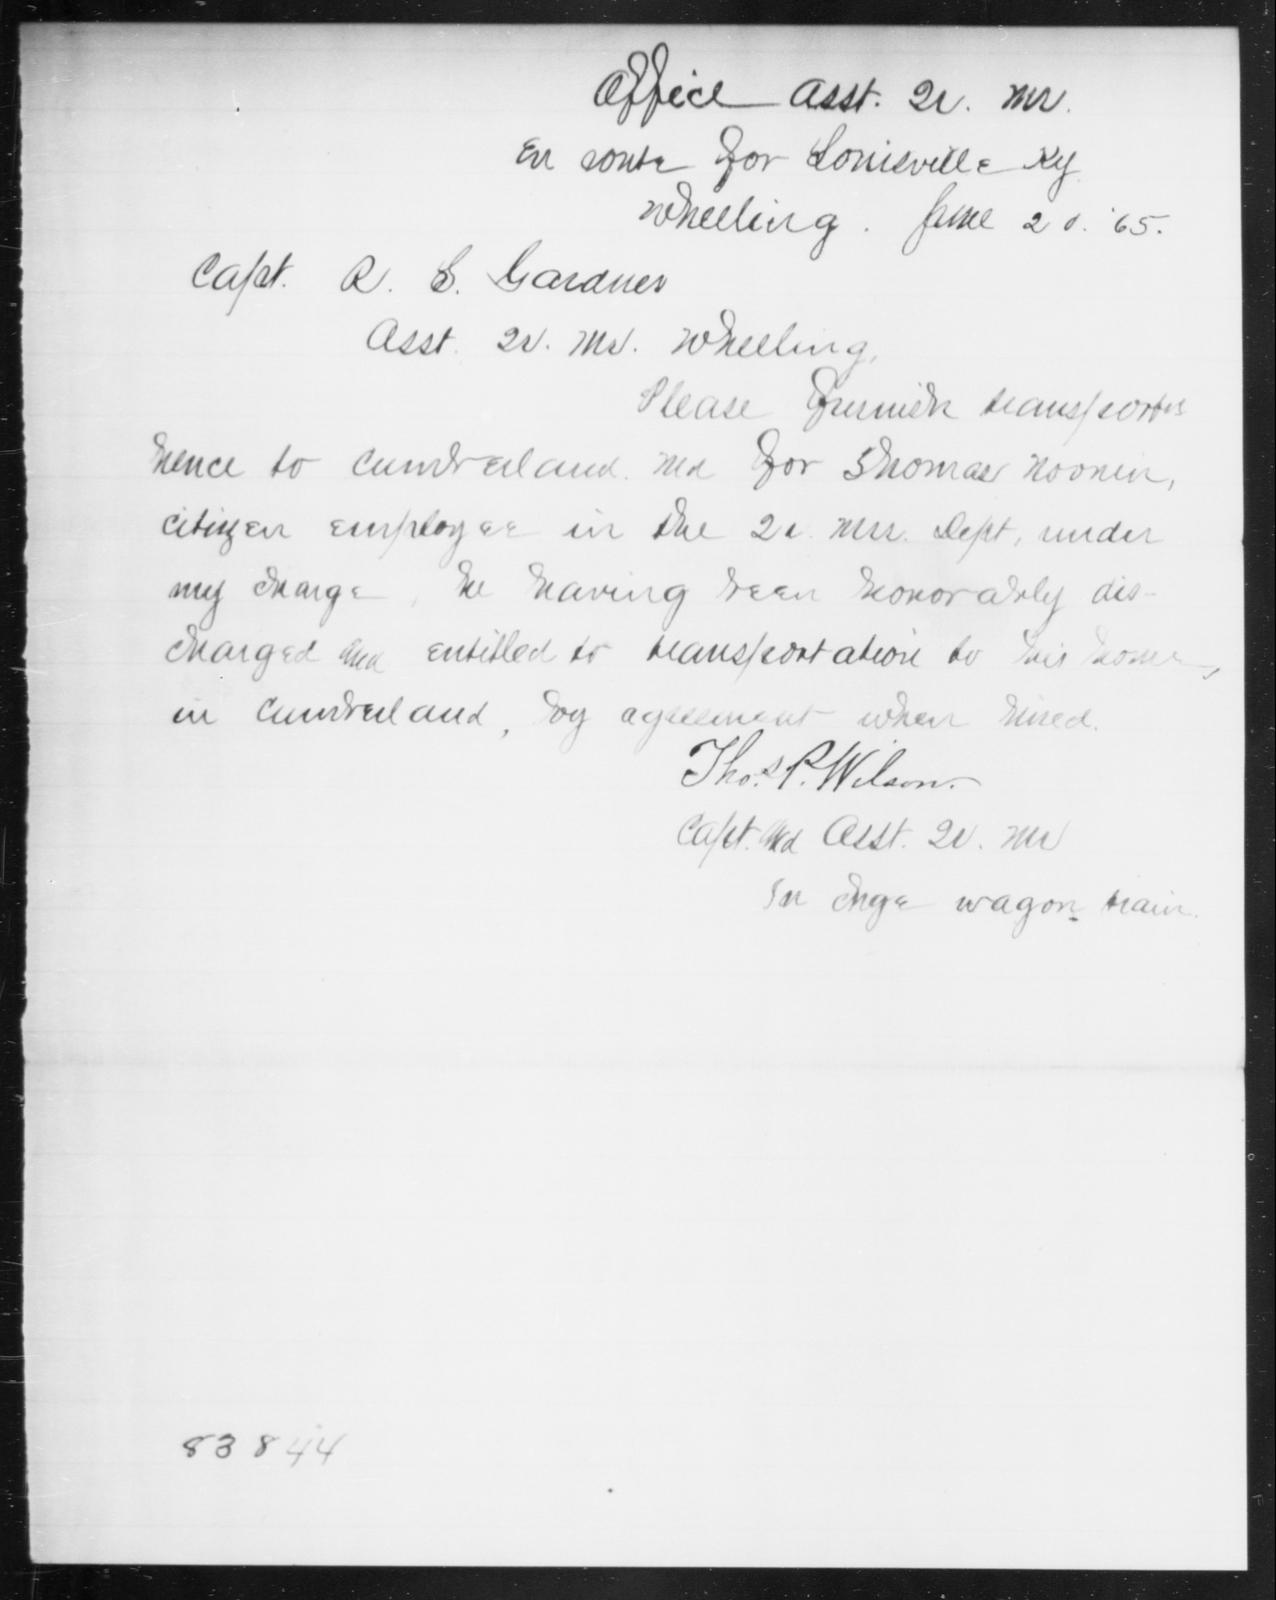 Noonen, Thomas - State: Kentucky - Year: 1865